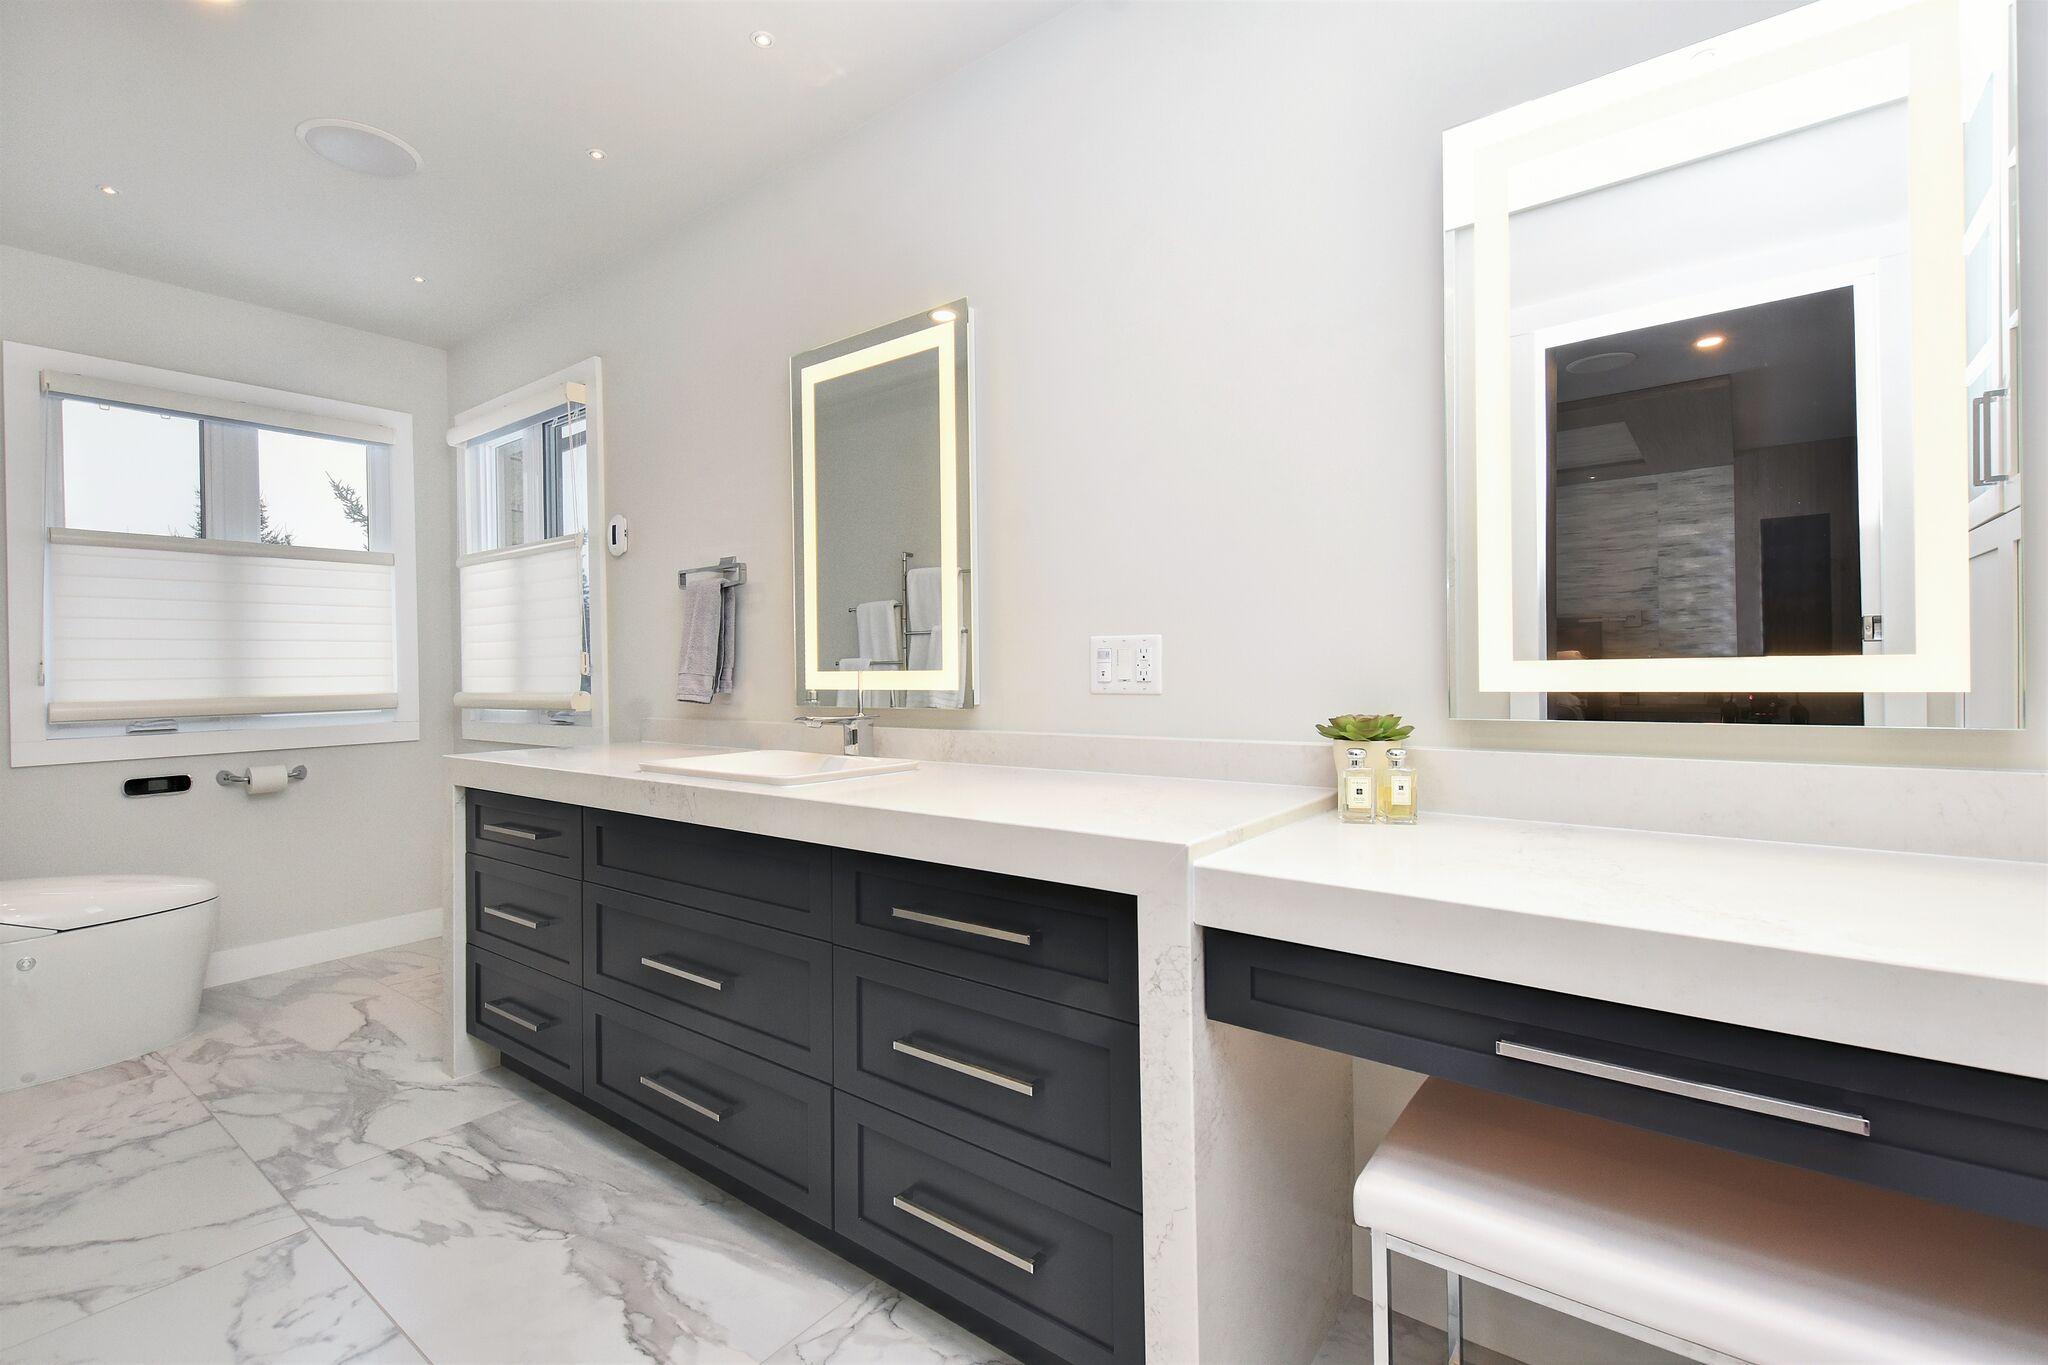 Modern Master bathroom, quartz countertop, LED lighted mirrors